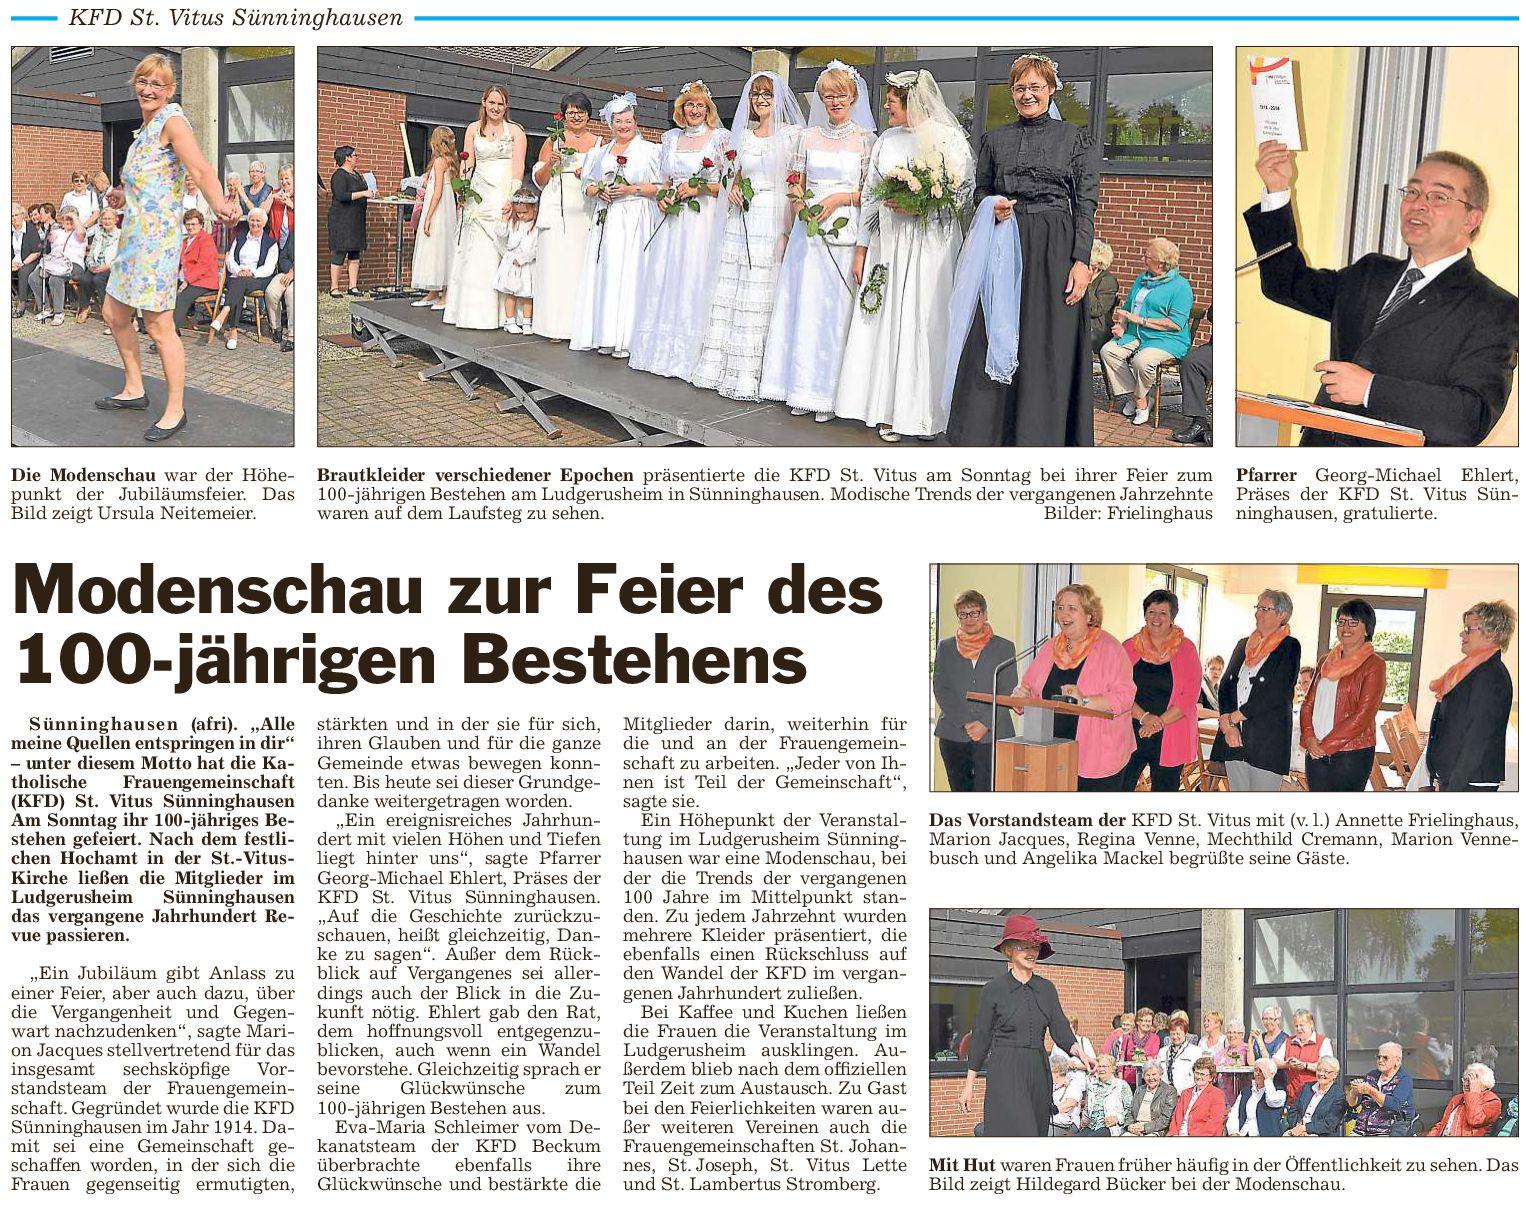 100 Jahre kfd St. Vitus Sünninghausen